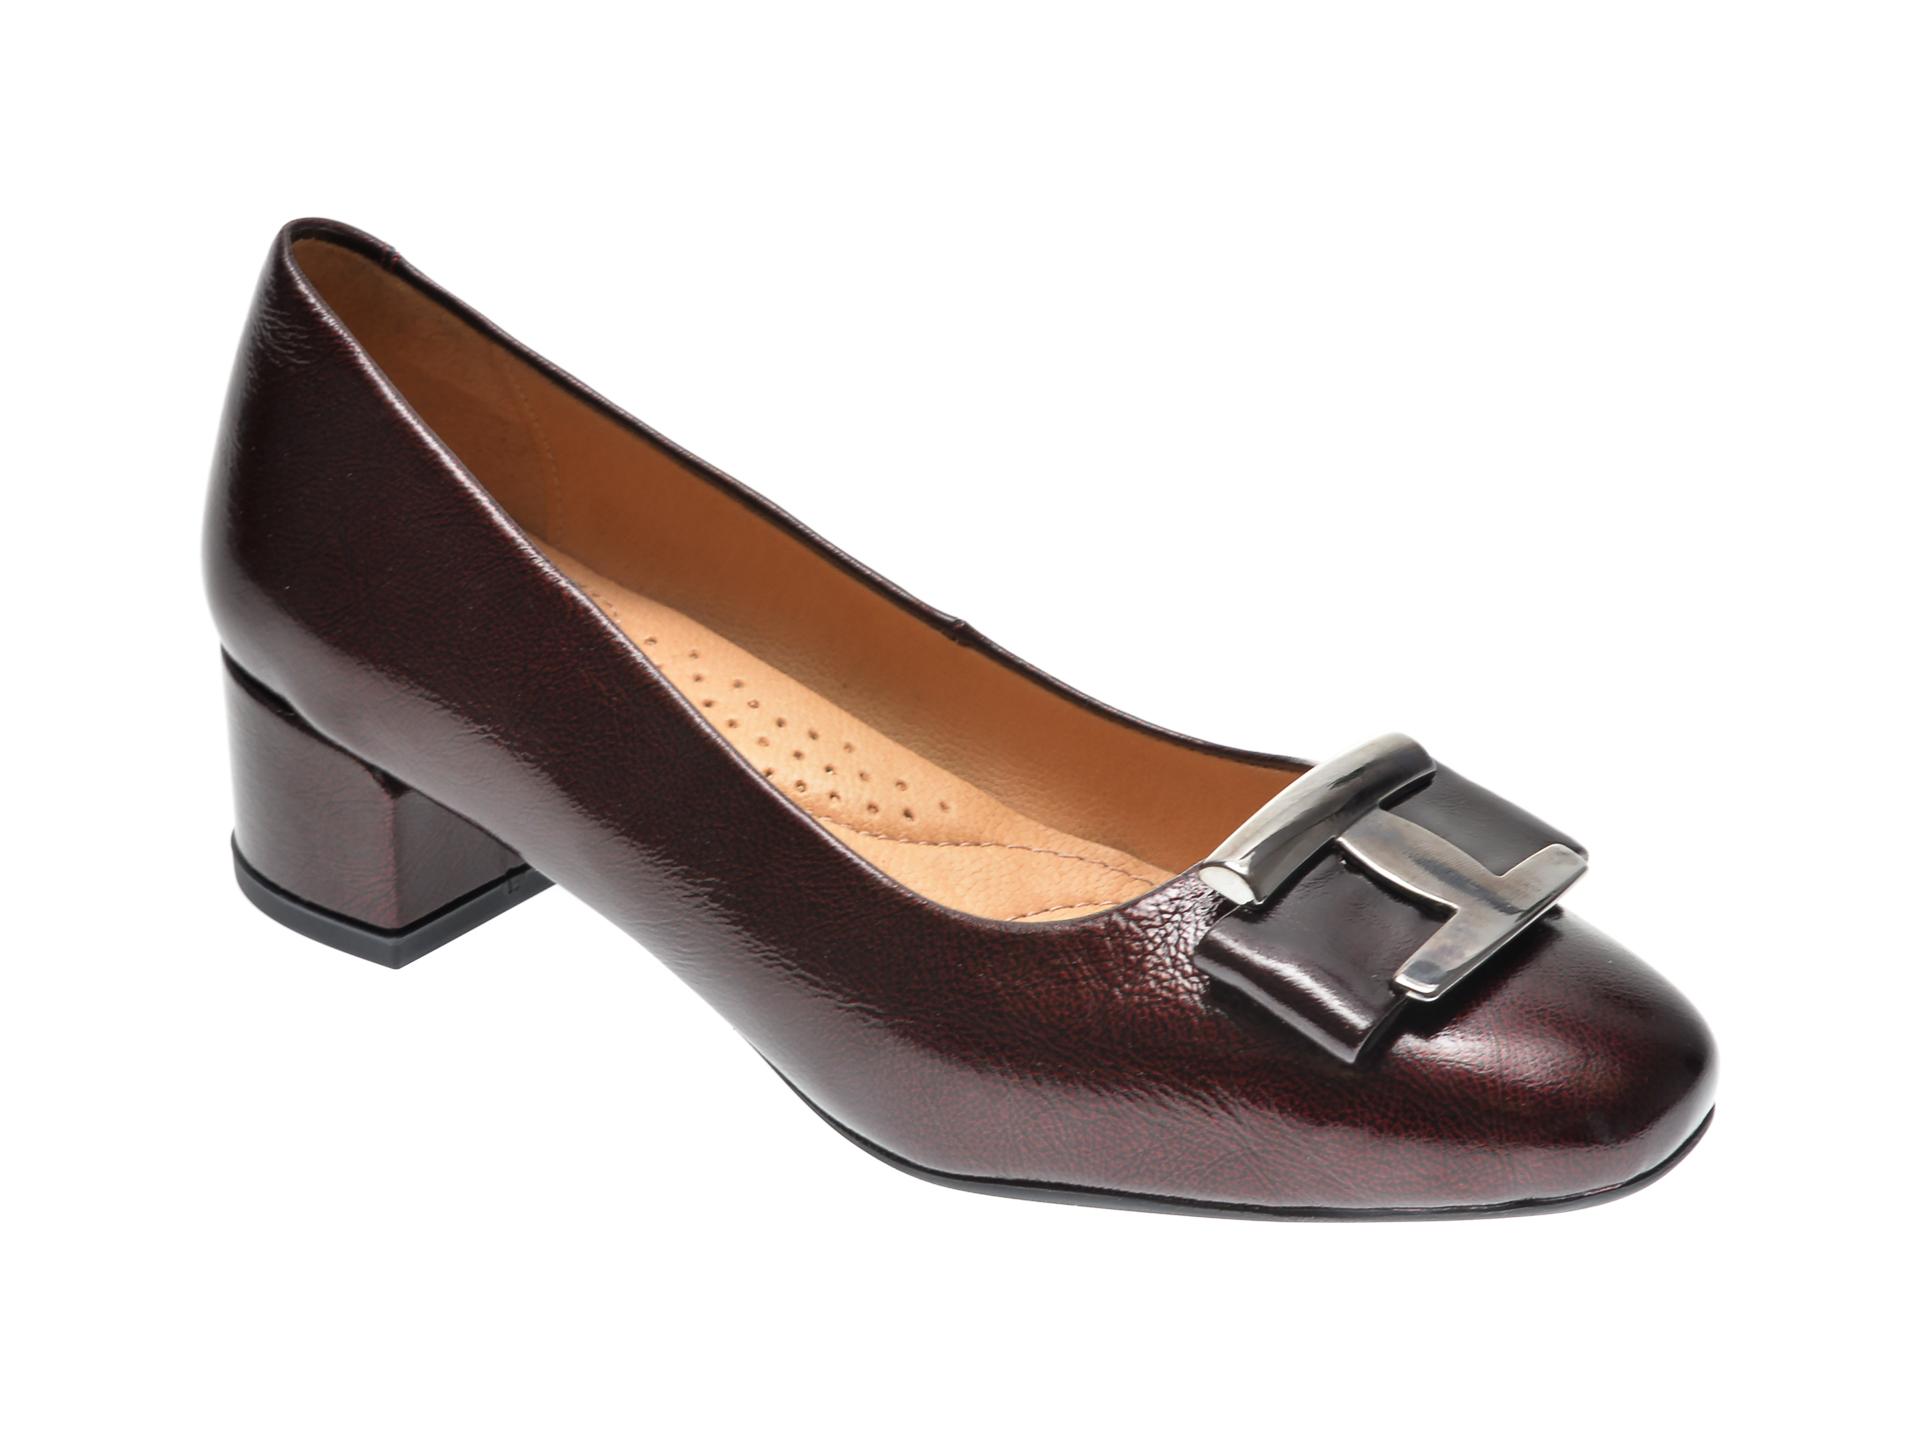 Pantofi PASS COLLECTION visinii, 560, din piele naturala lacuita New